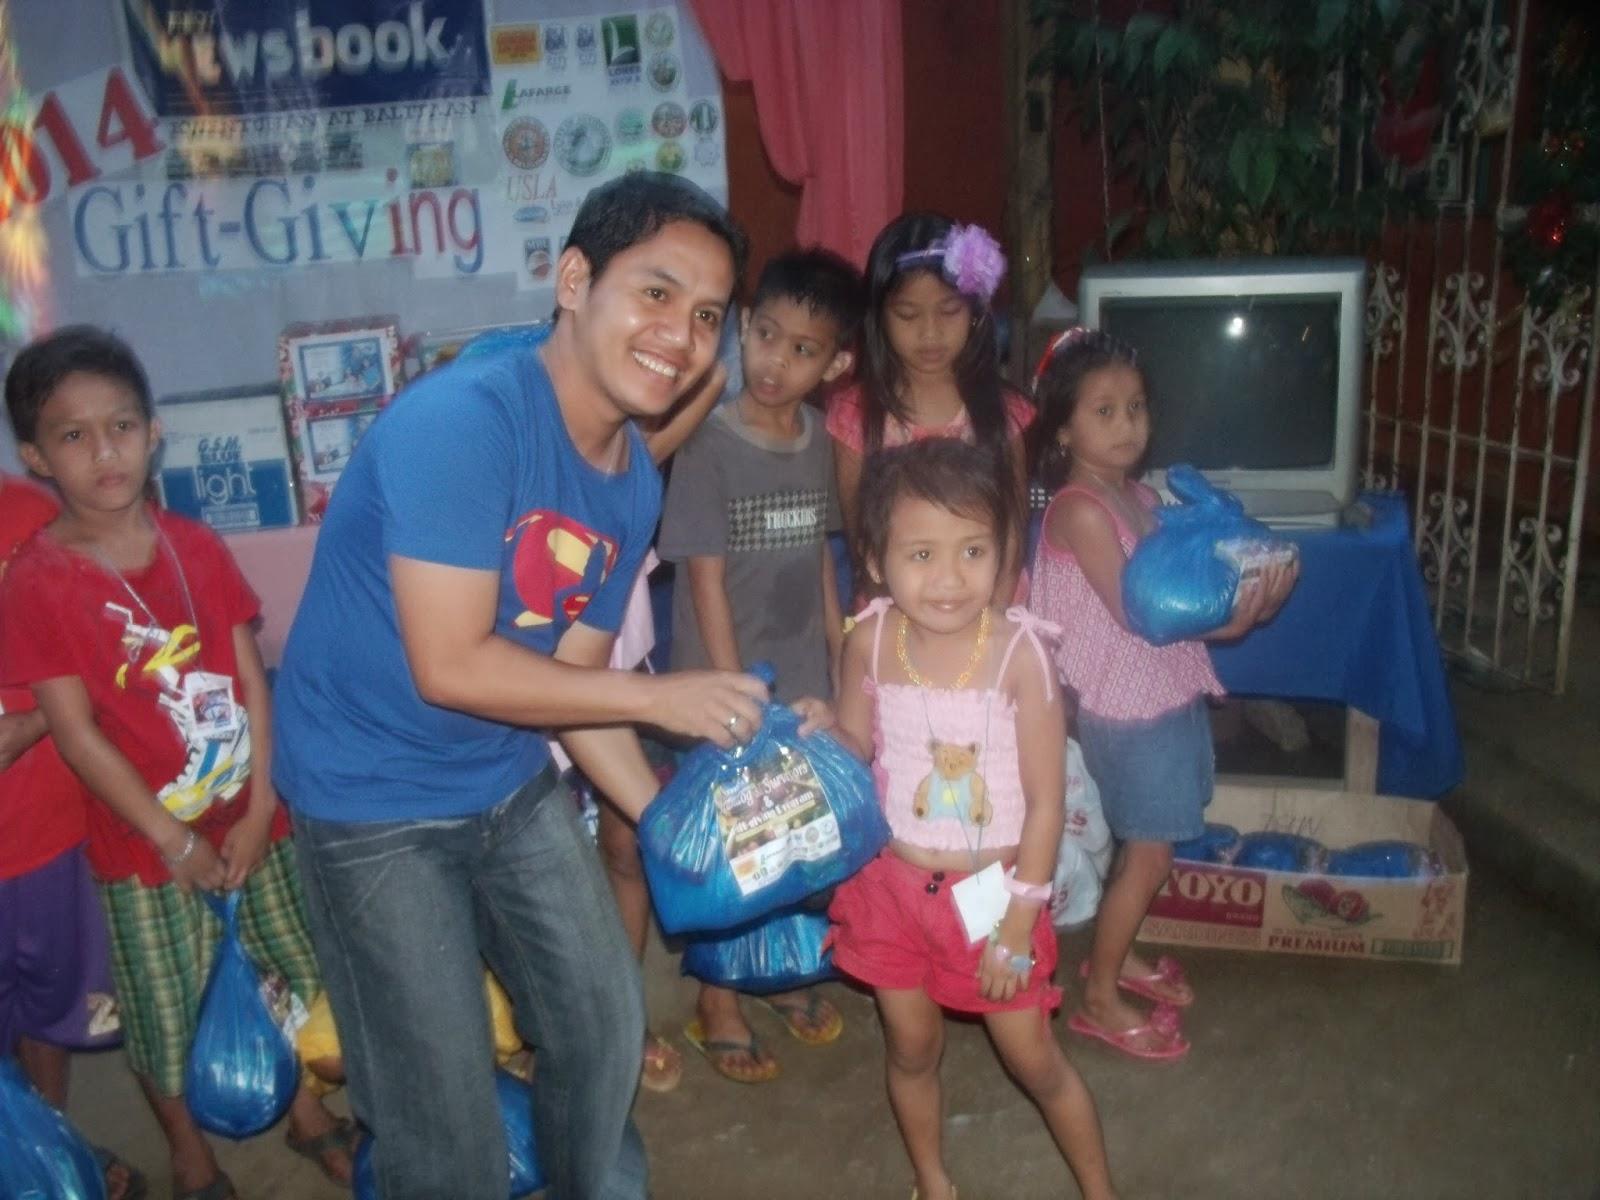 pinoy newsbook